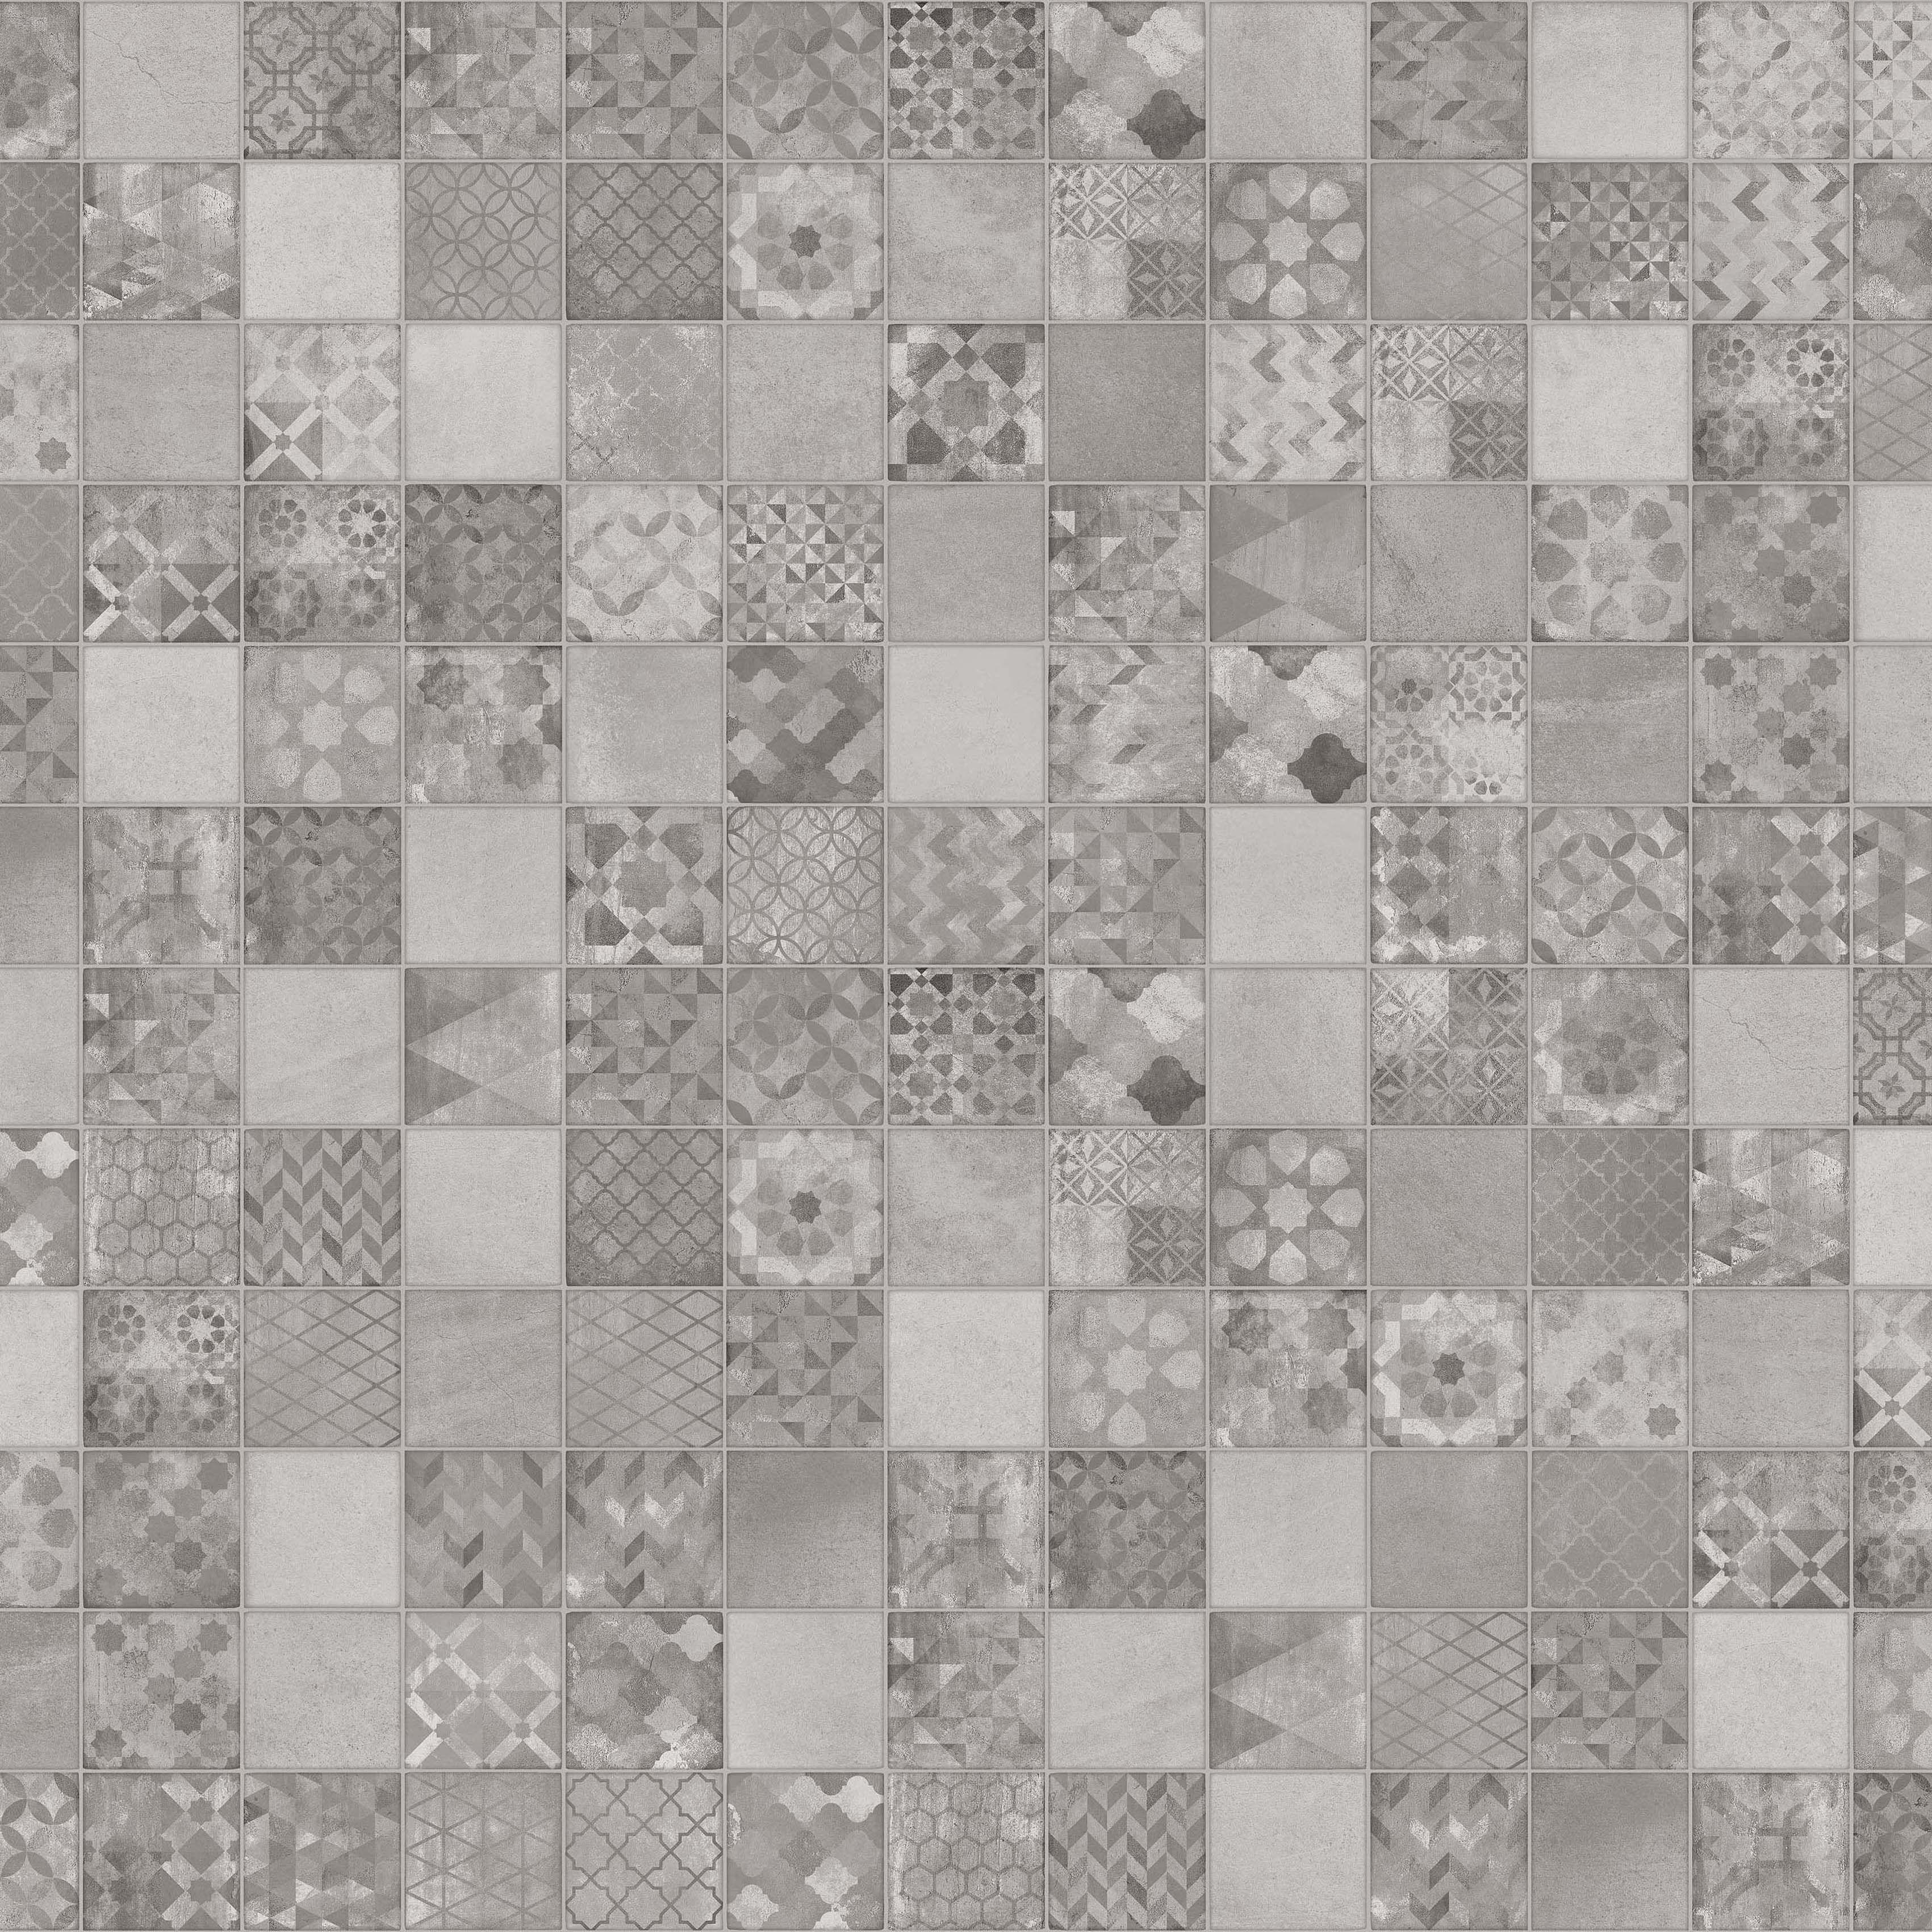 Vives Wall Tiles White Body Kent 20x50 Wall Tiles Tiles Wall